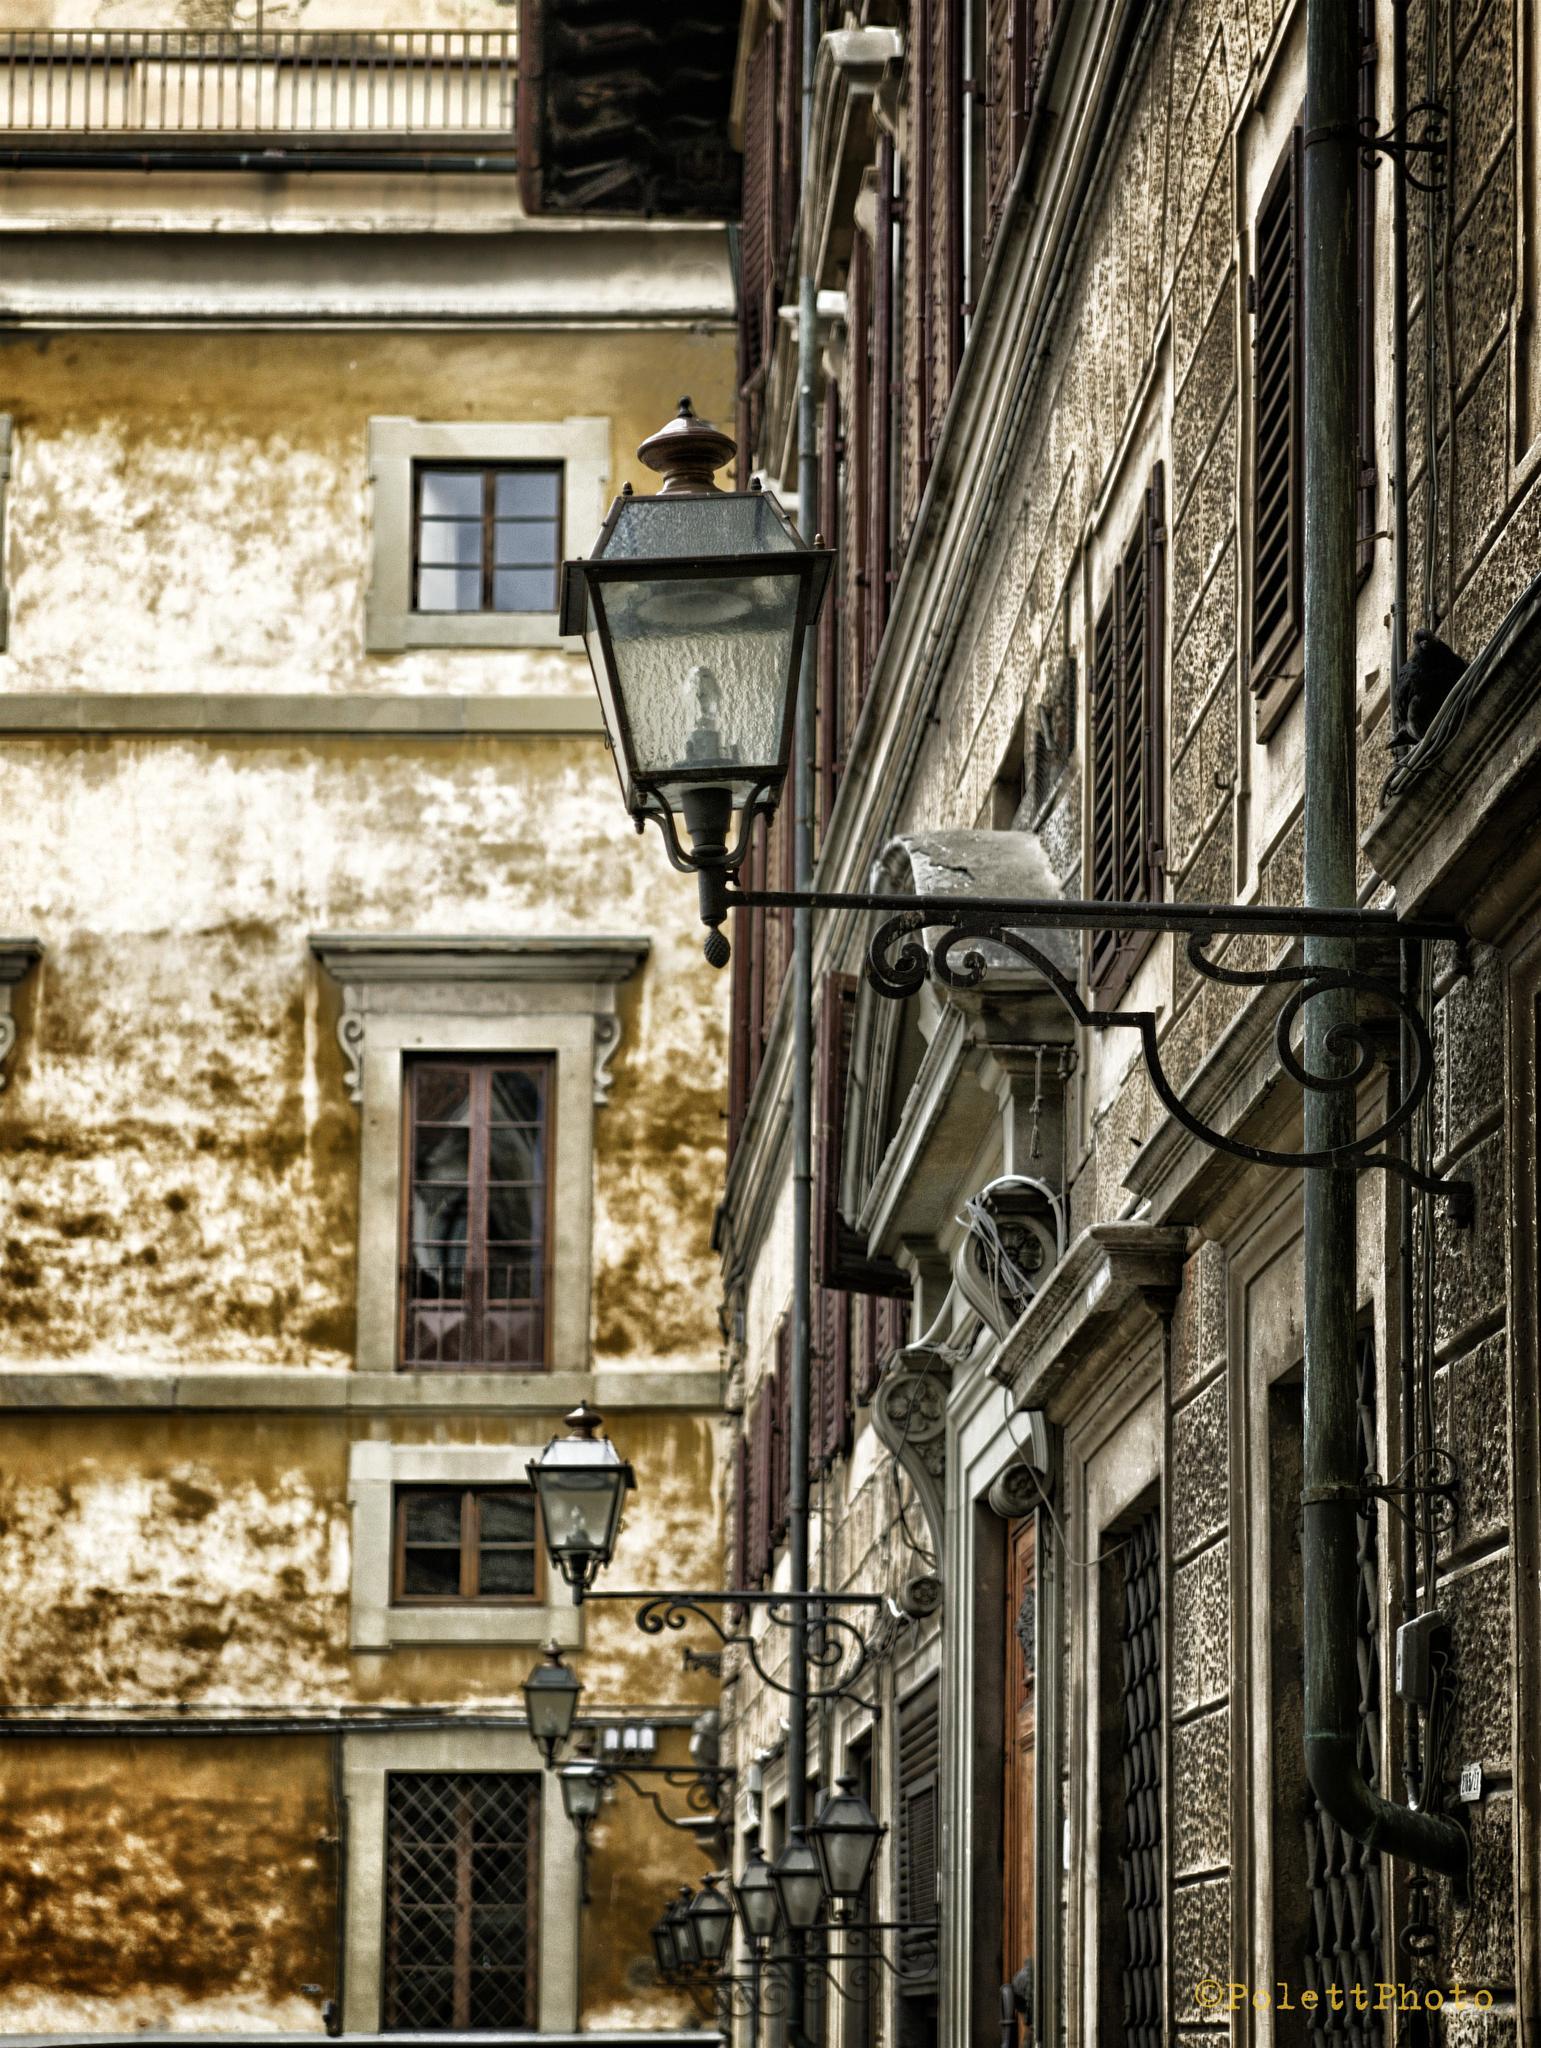 Street Detail by Polettphoto